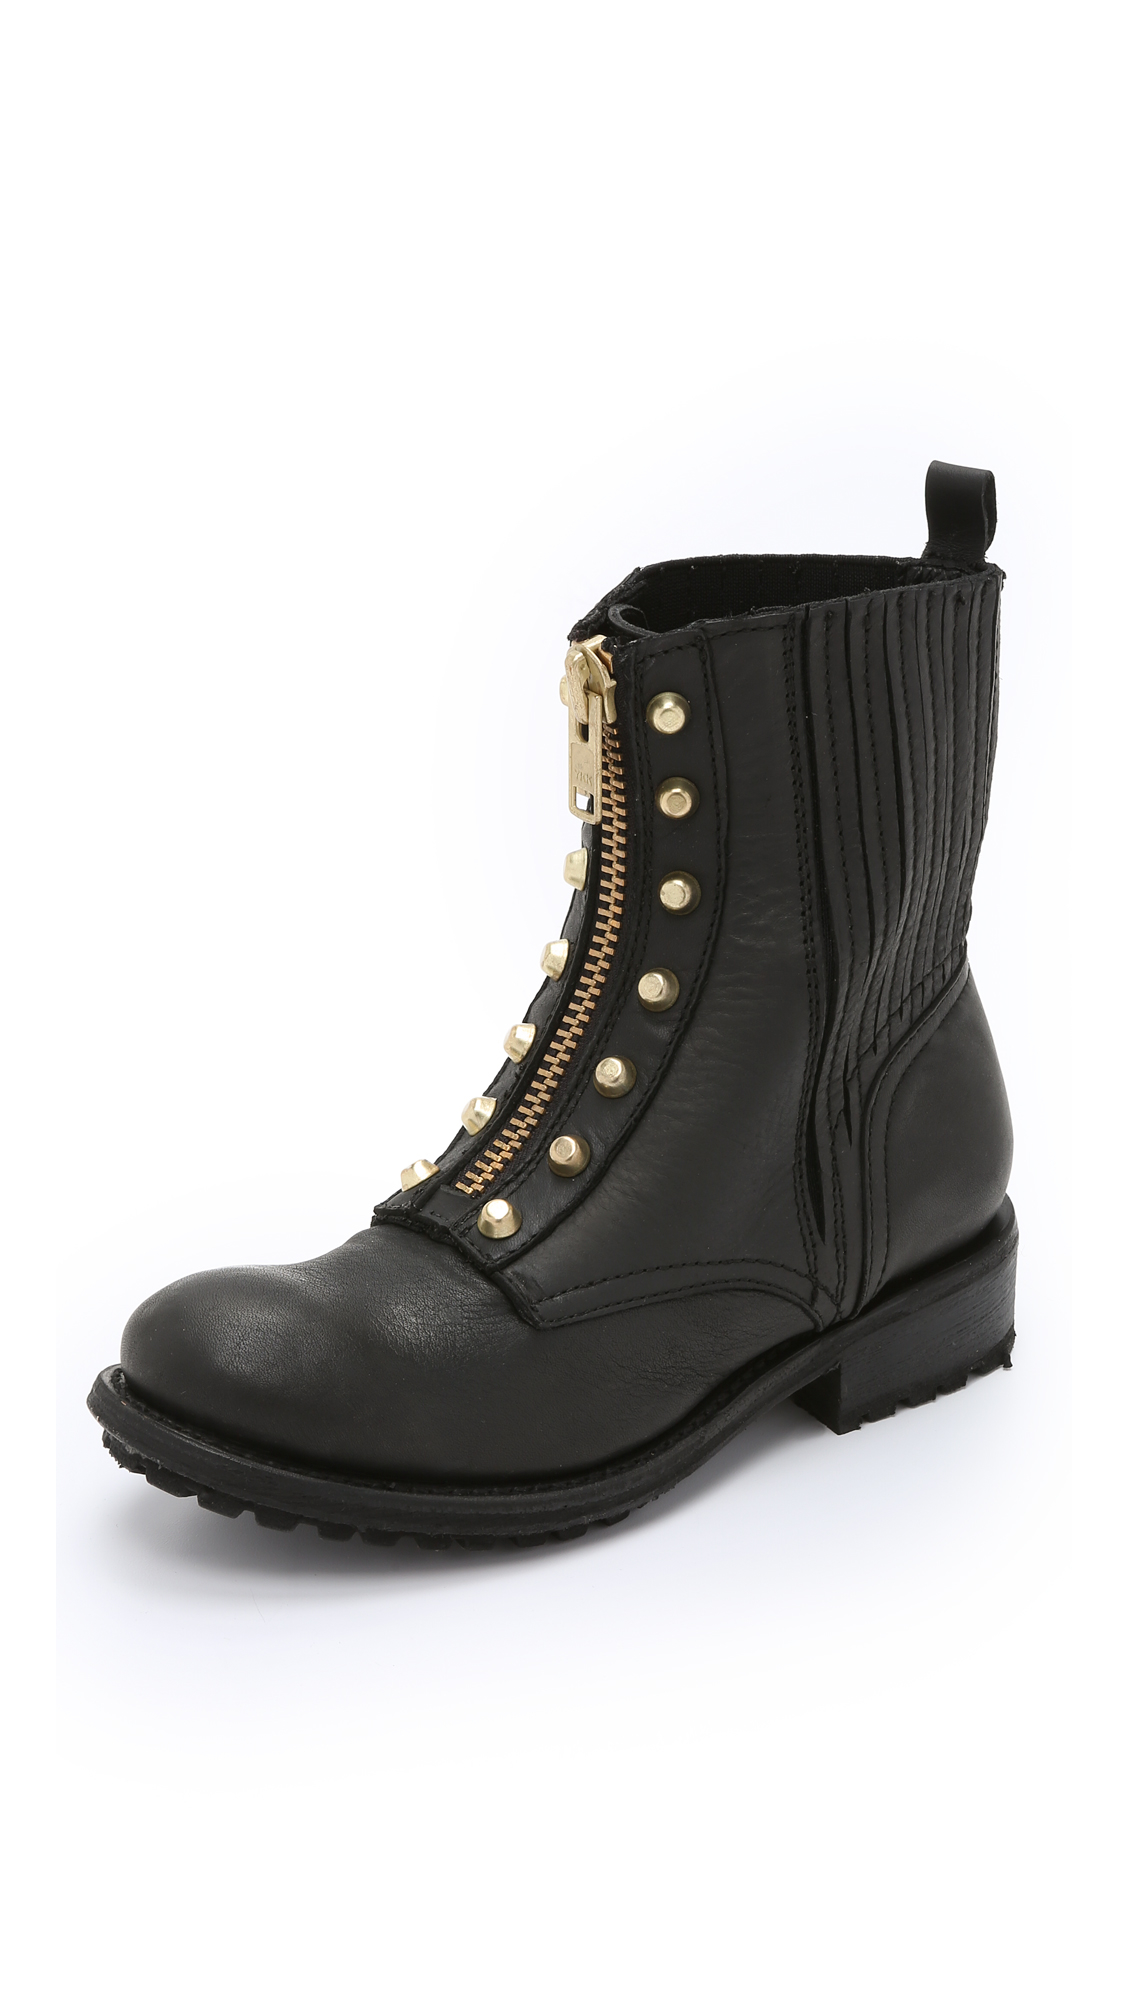 ash rachel combat boots black in black lyst. Black Bedroom Furniture Sets. Home Design Ideas